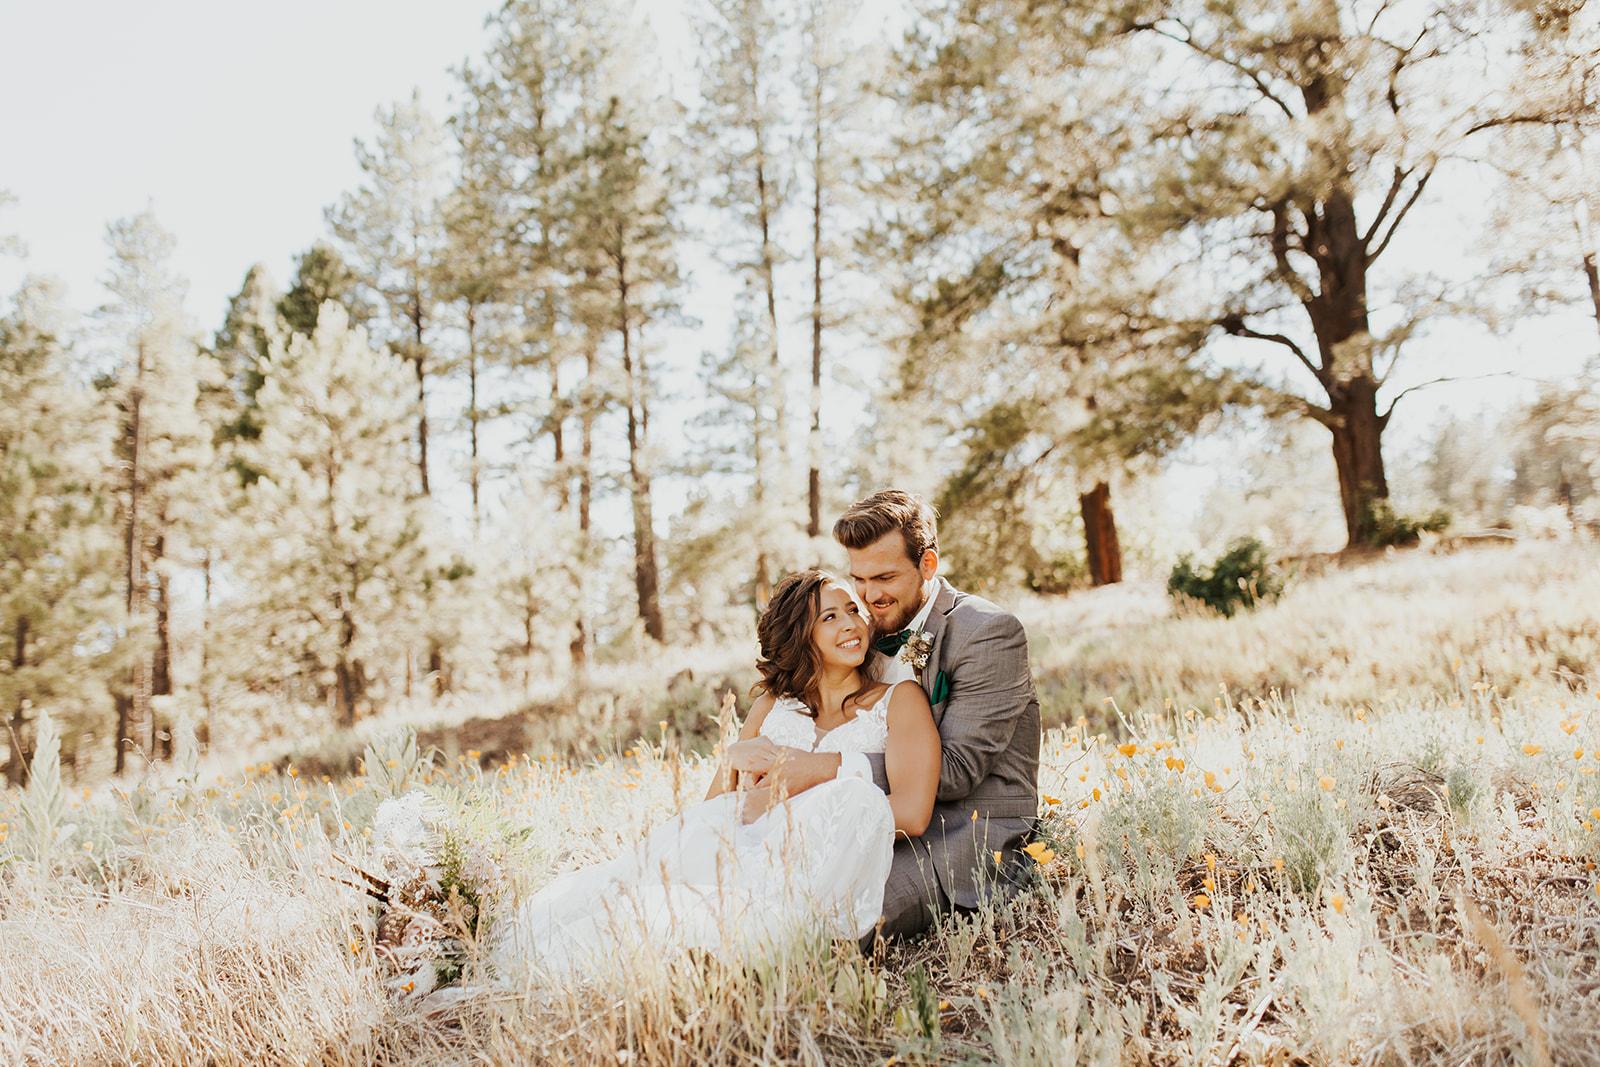 Aldea Weddings In The Woods